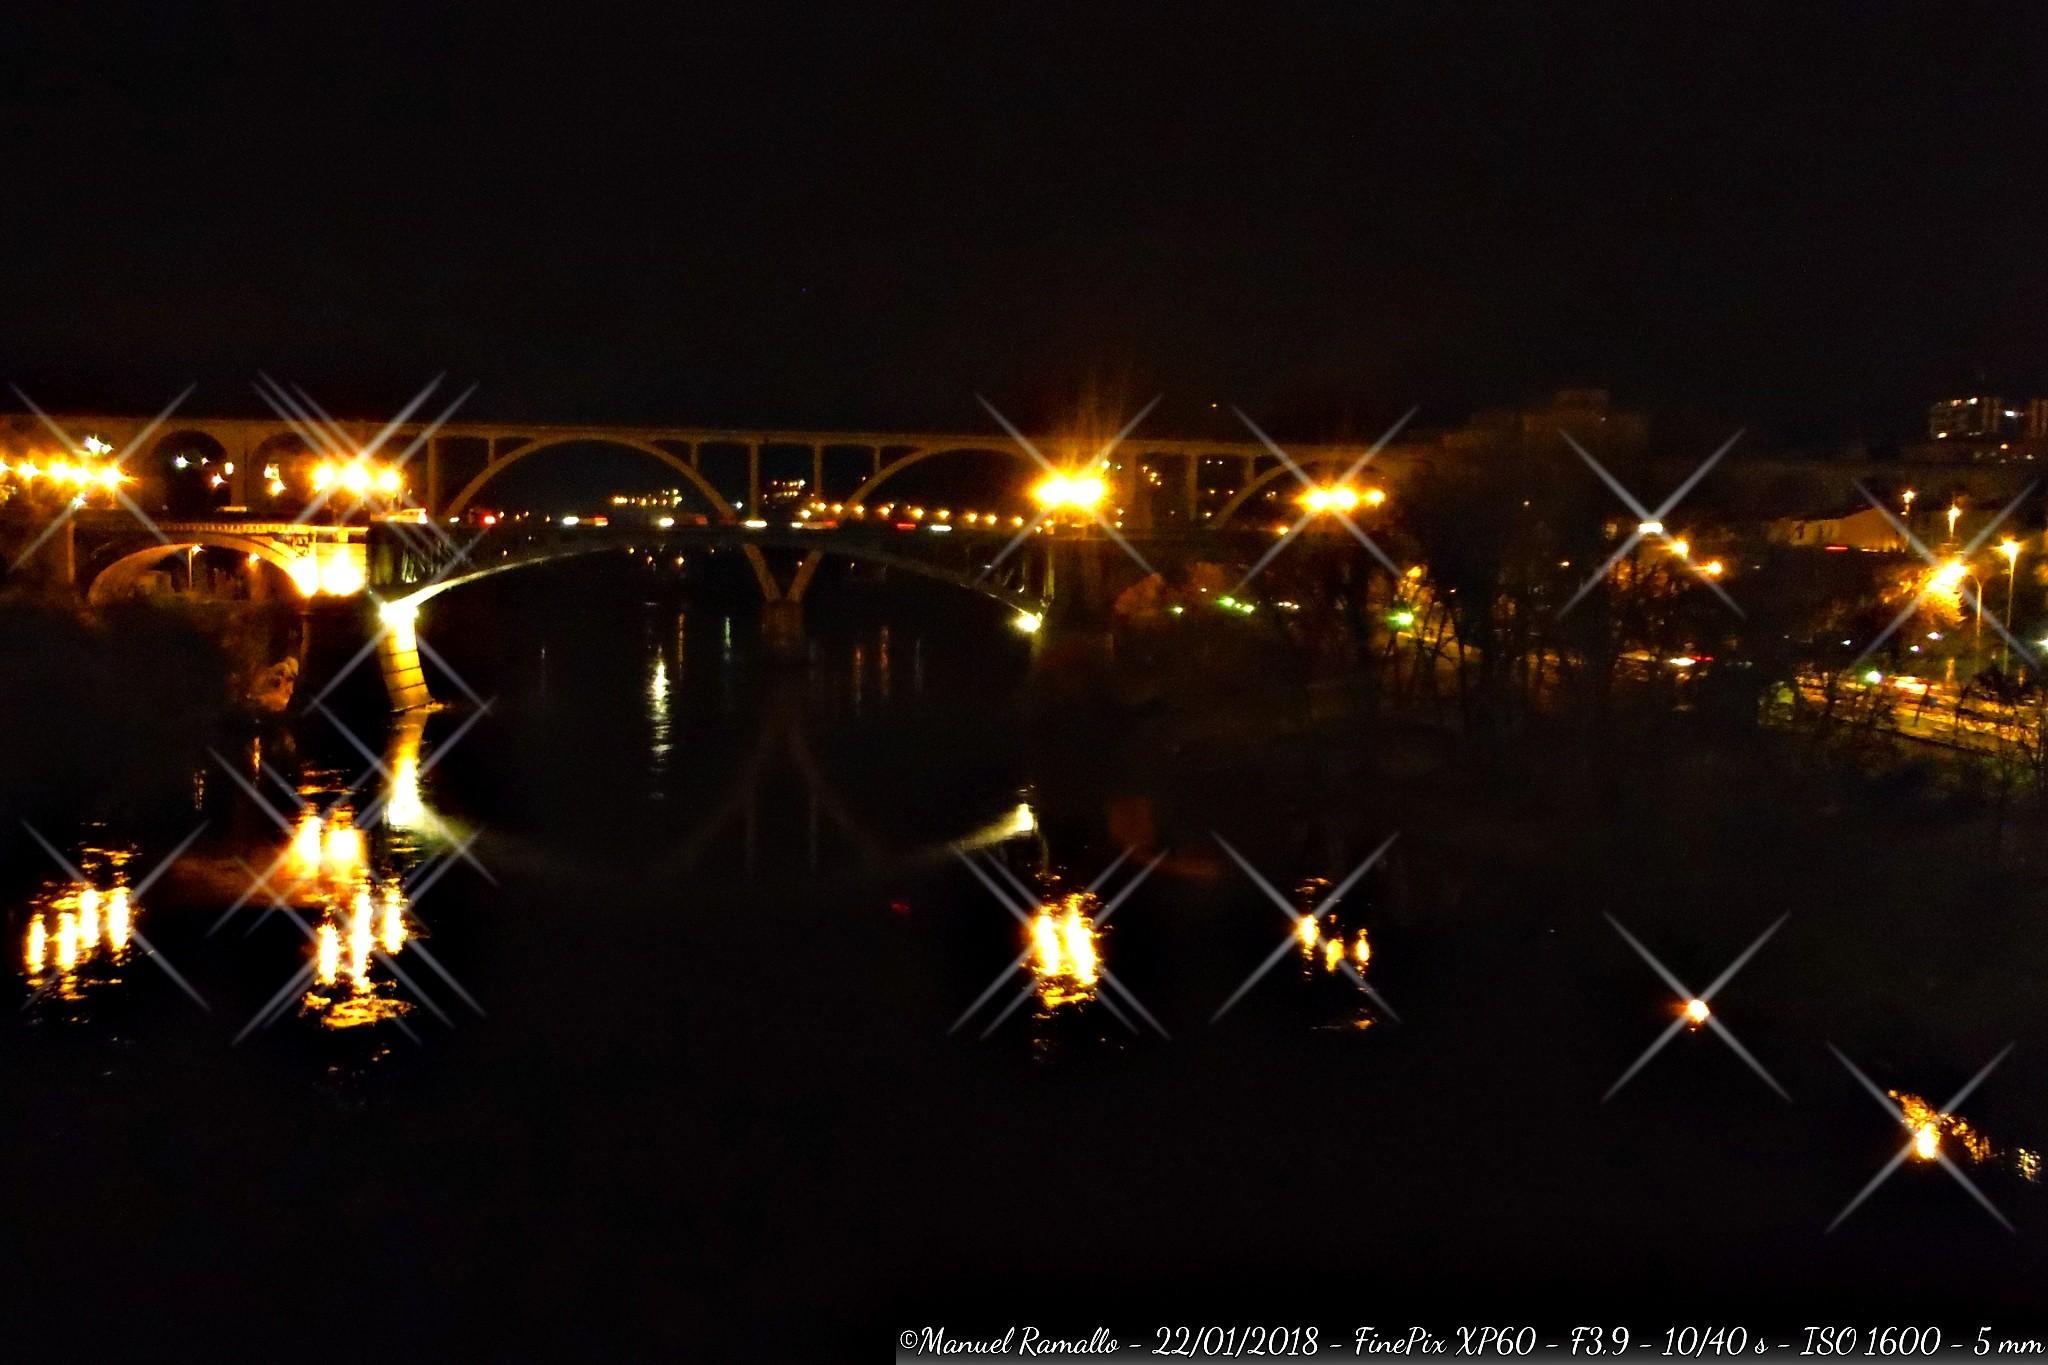 puente-ferrocarril-ourense-de-noche